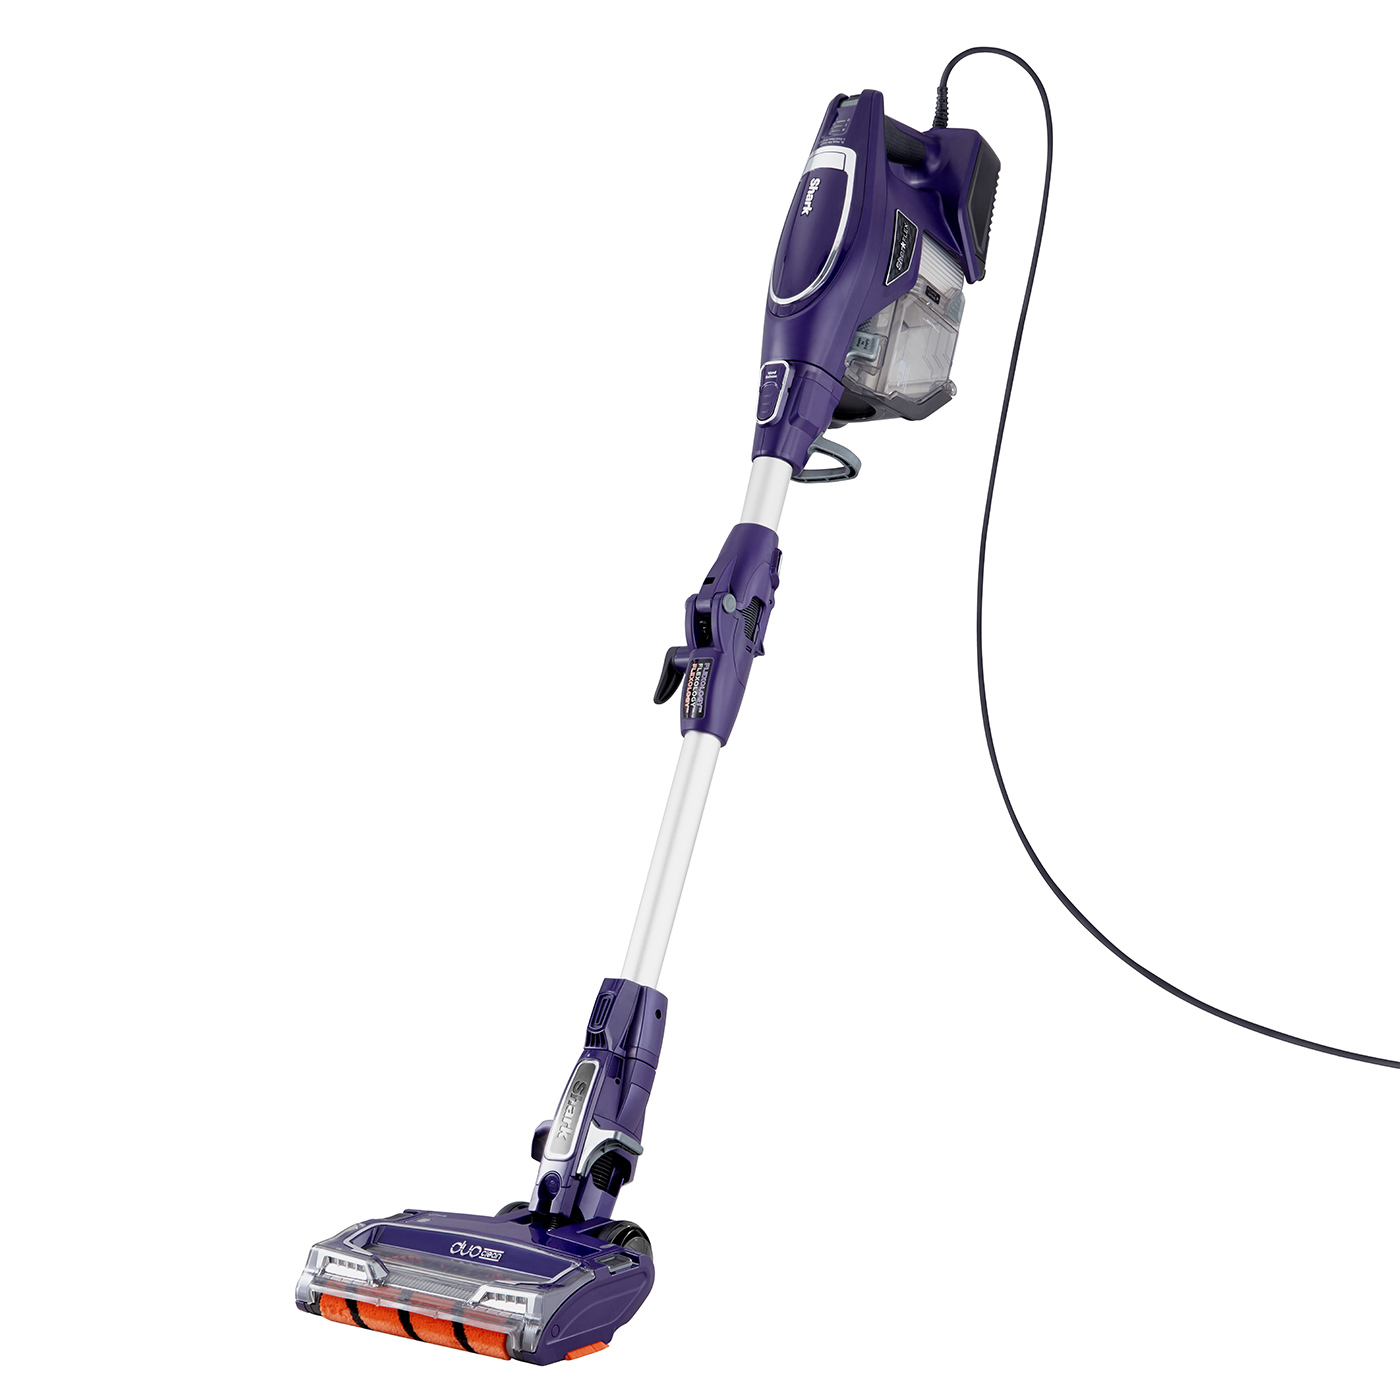 Shark DuoClean Corded Stick Vacuum Cleaner HV390UK